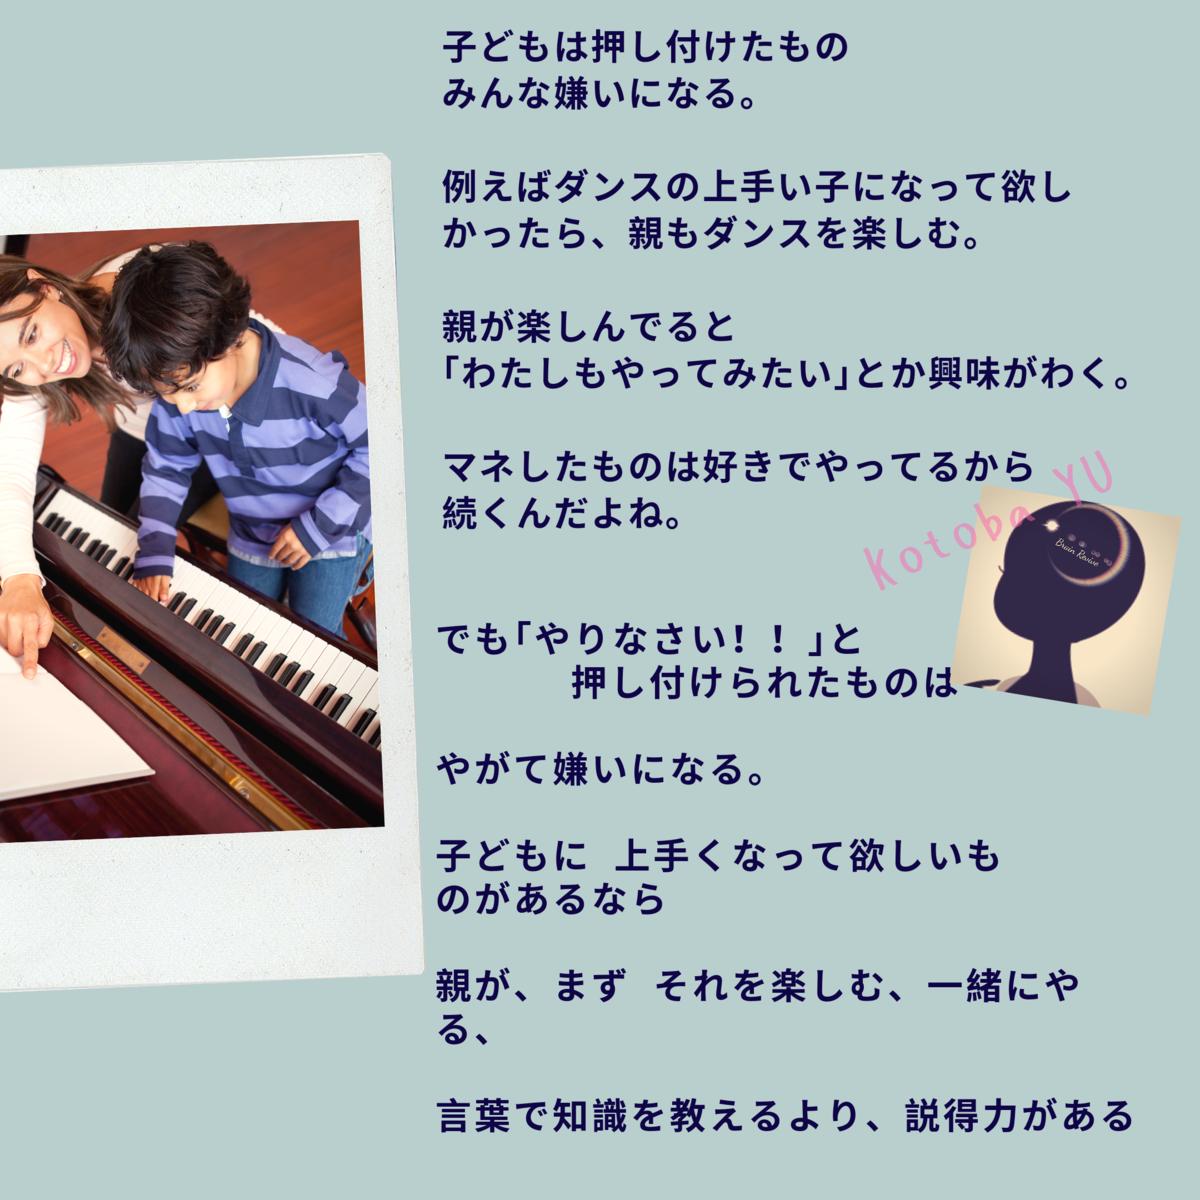 f:id:yuyu-s:20190622153849p:plain